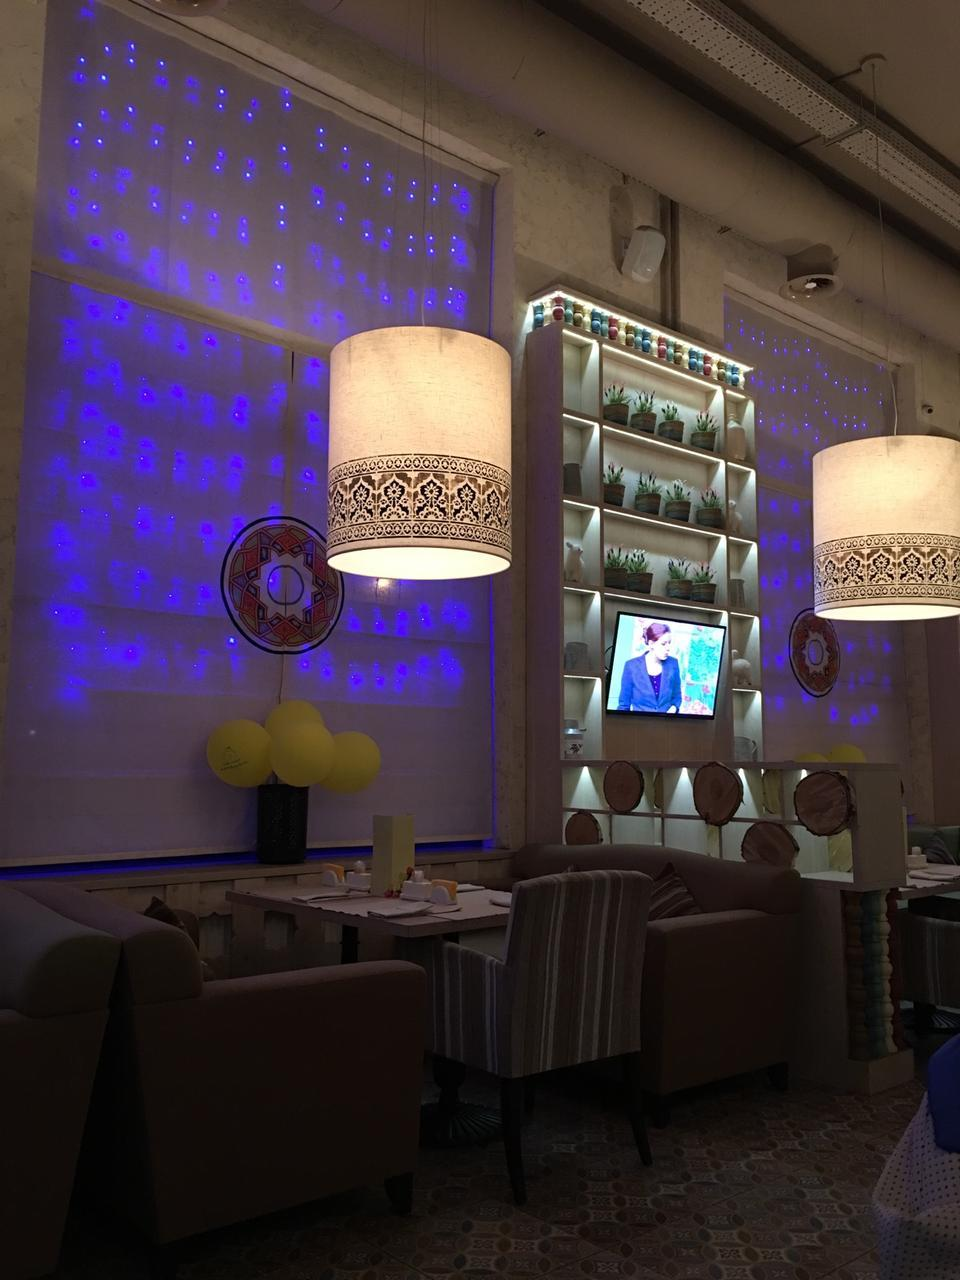 Восточное Кафе Лепешка в Королеве фото 26